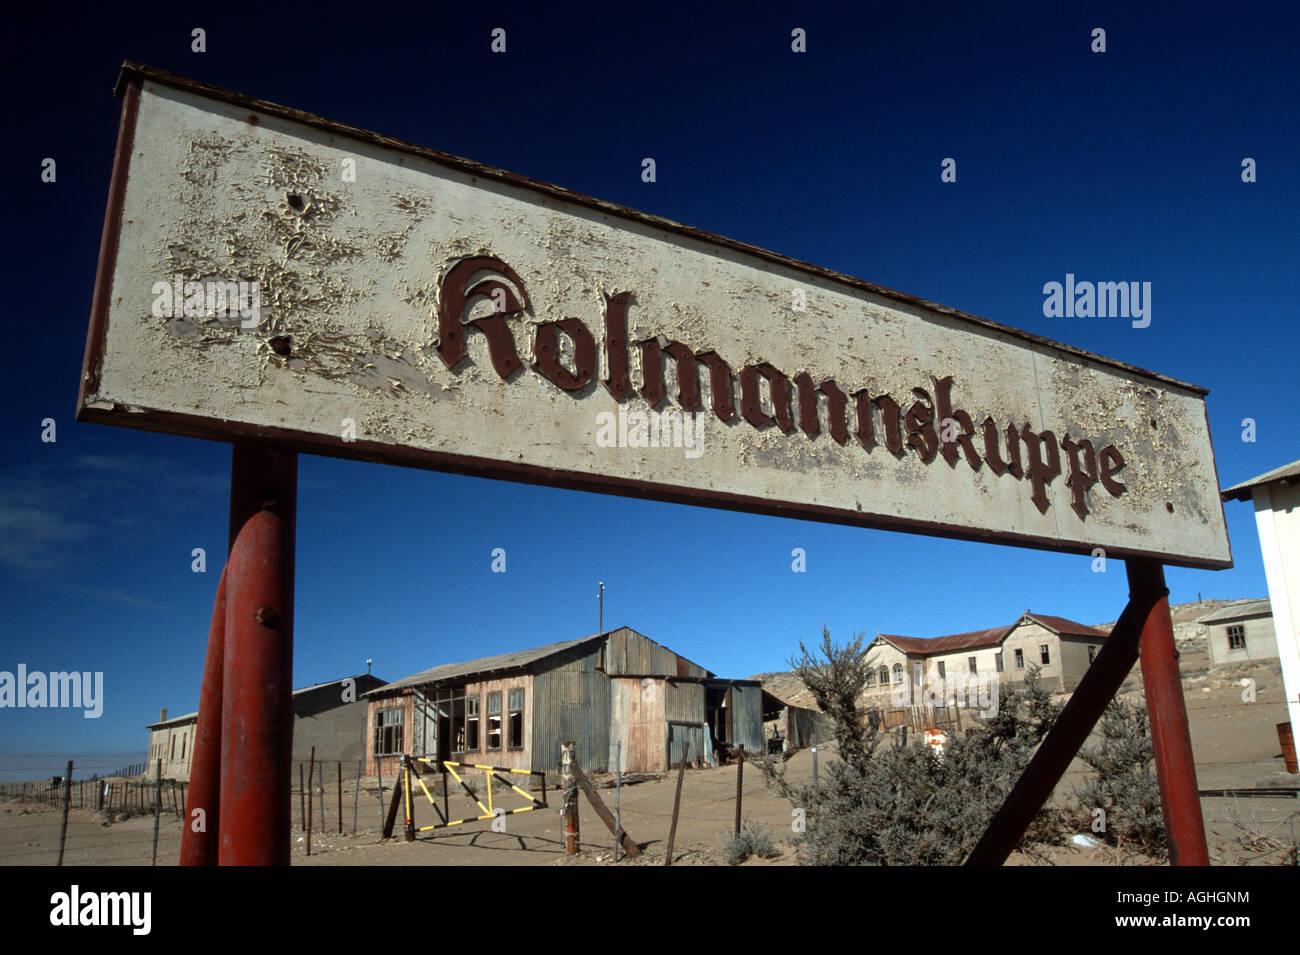 Kolmannskuppe, old town of diamond searchers, Namibia, Luederitz - Stock Image